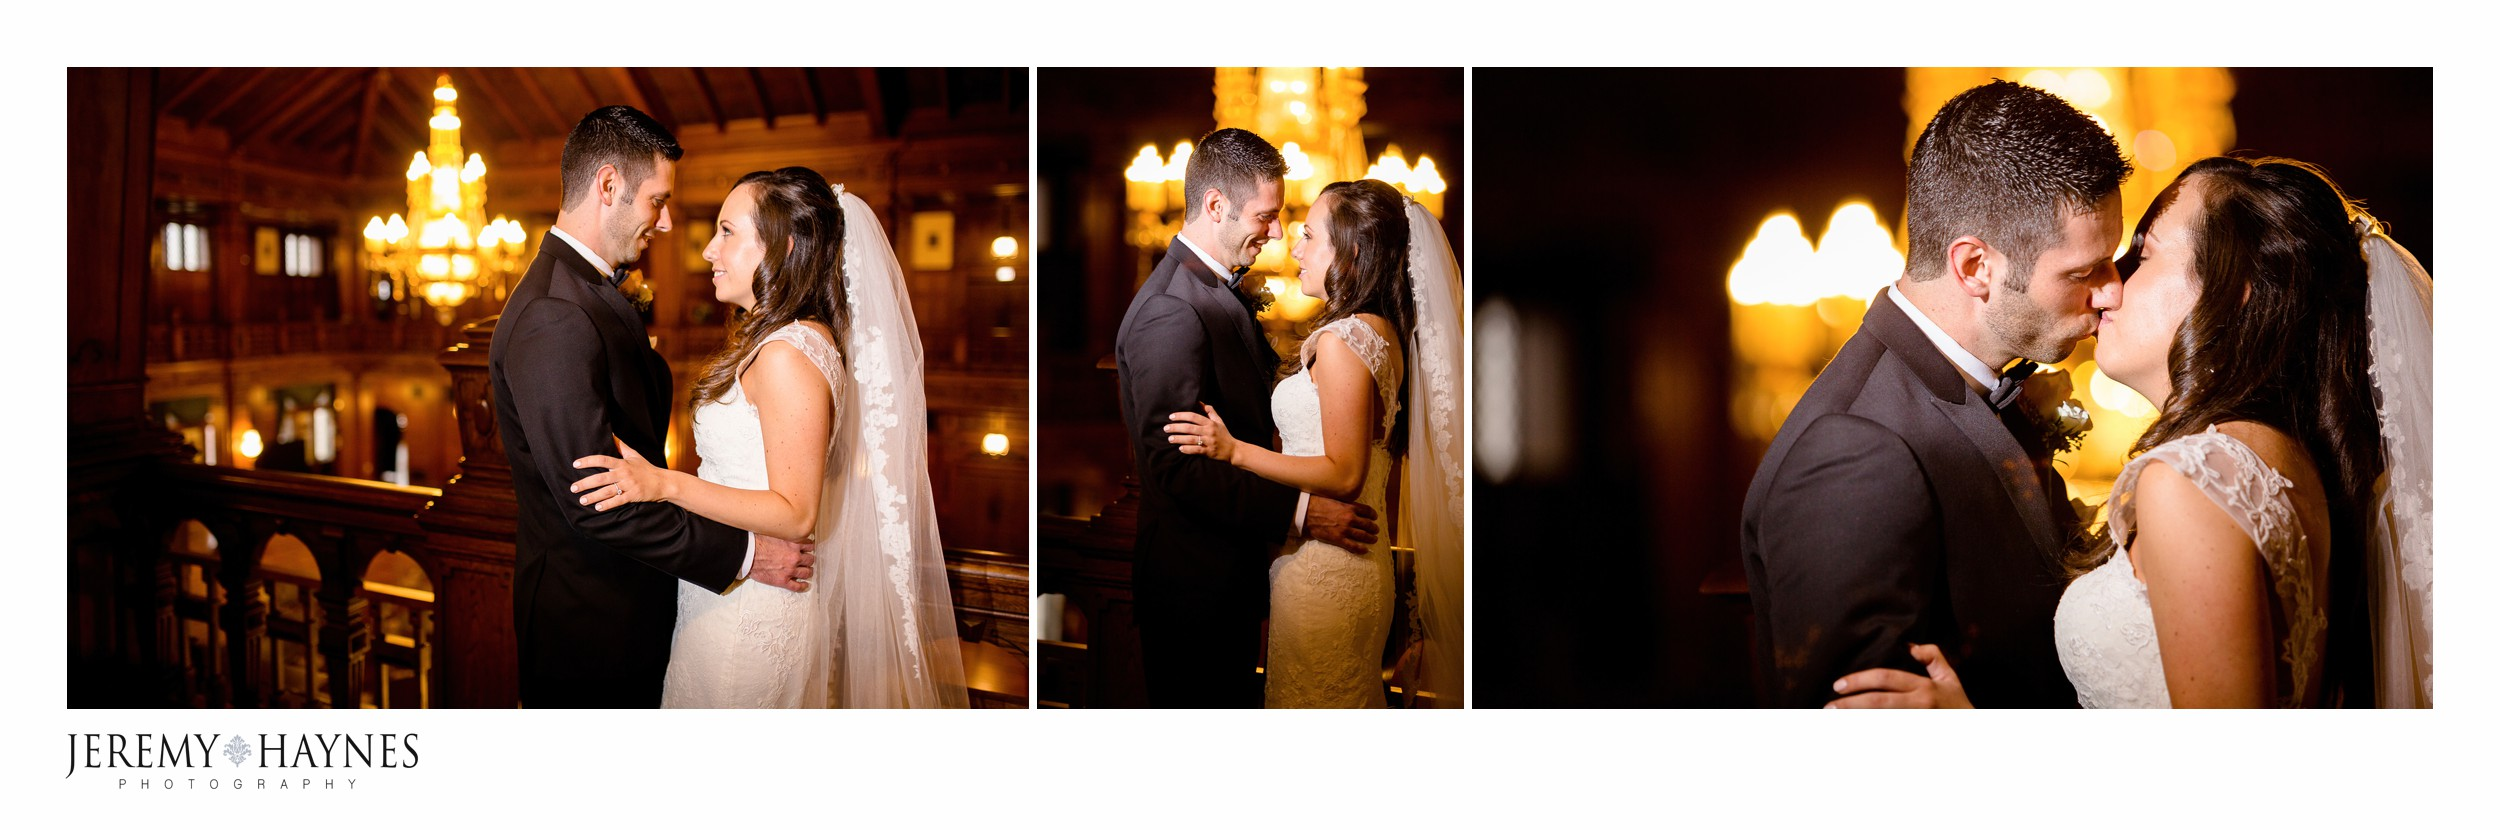 romantic-scottish-rite-cathedral-wedding.jpg